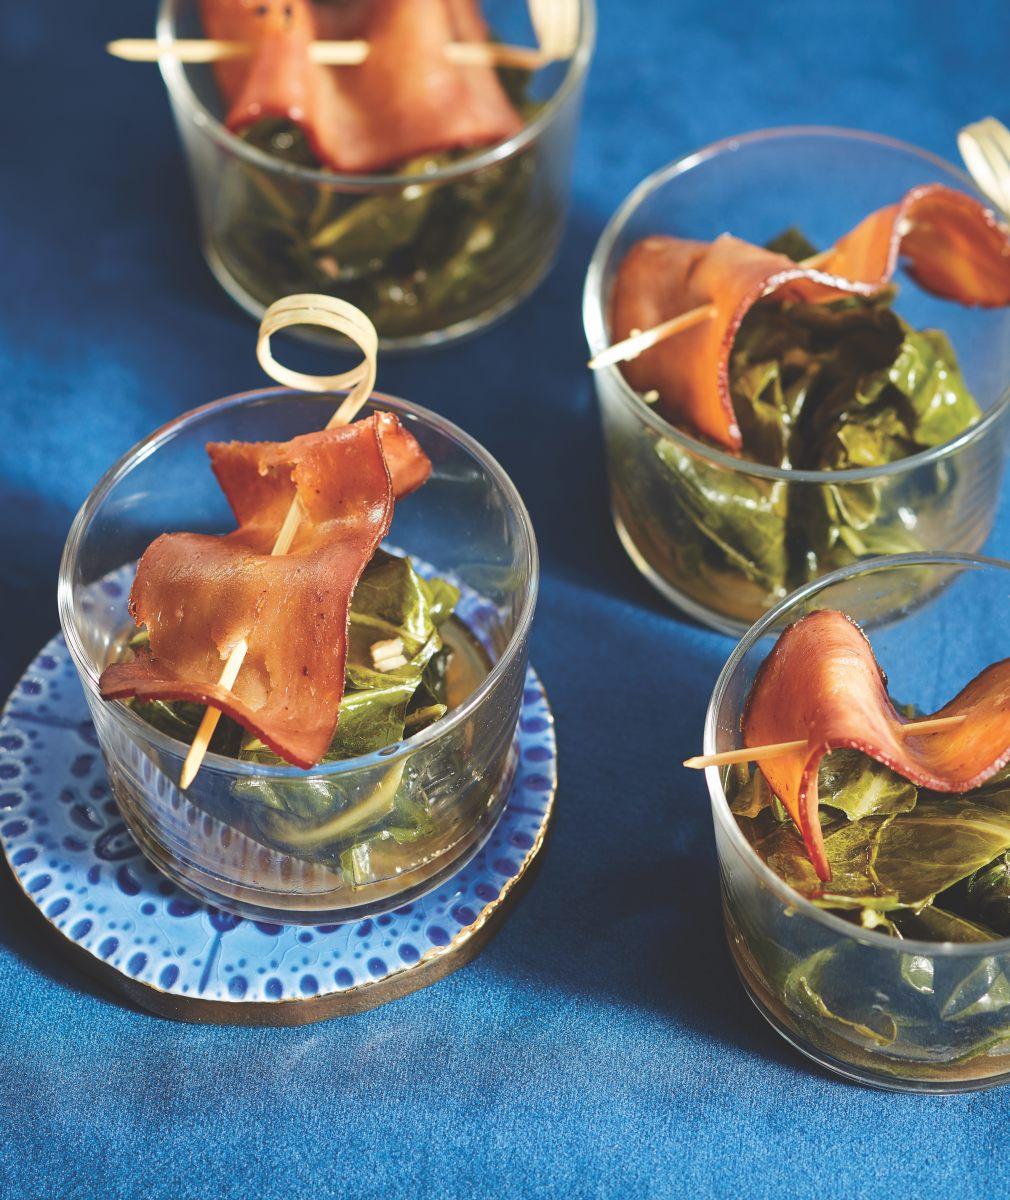 Braised Collard Greens with Turkey Bacon